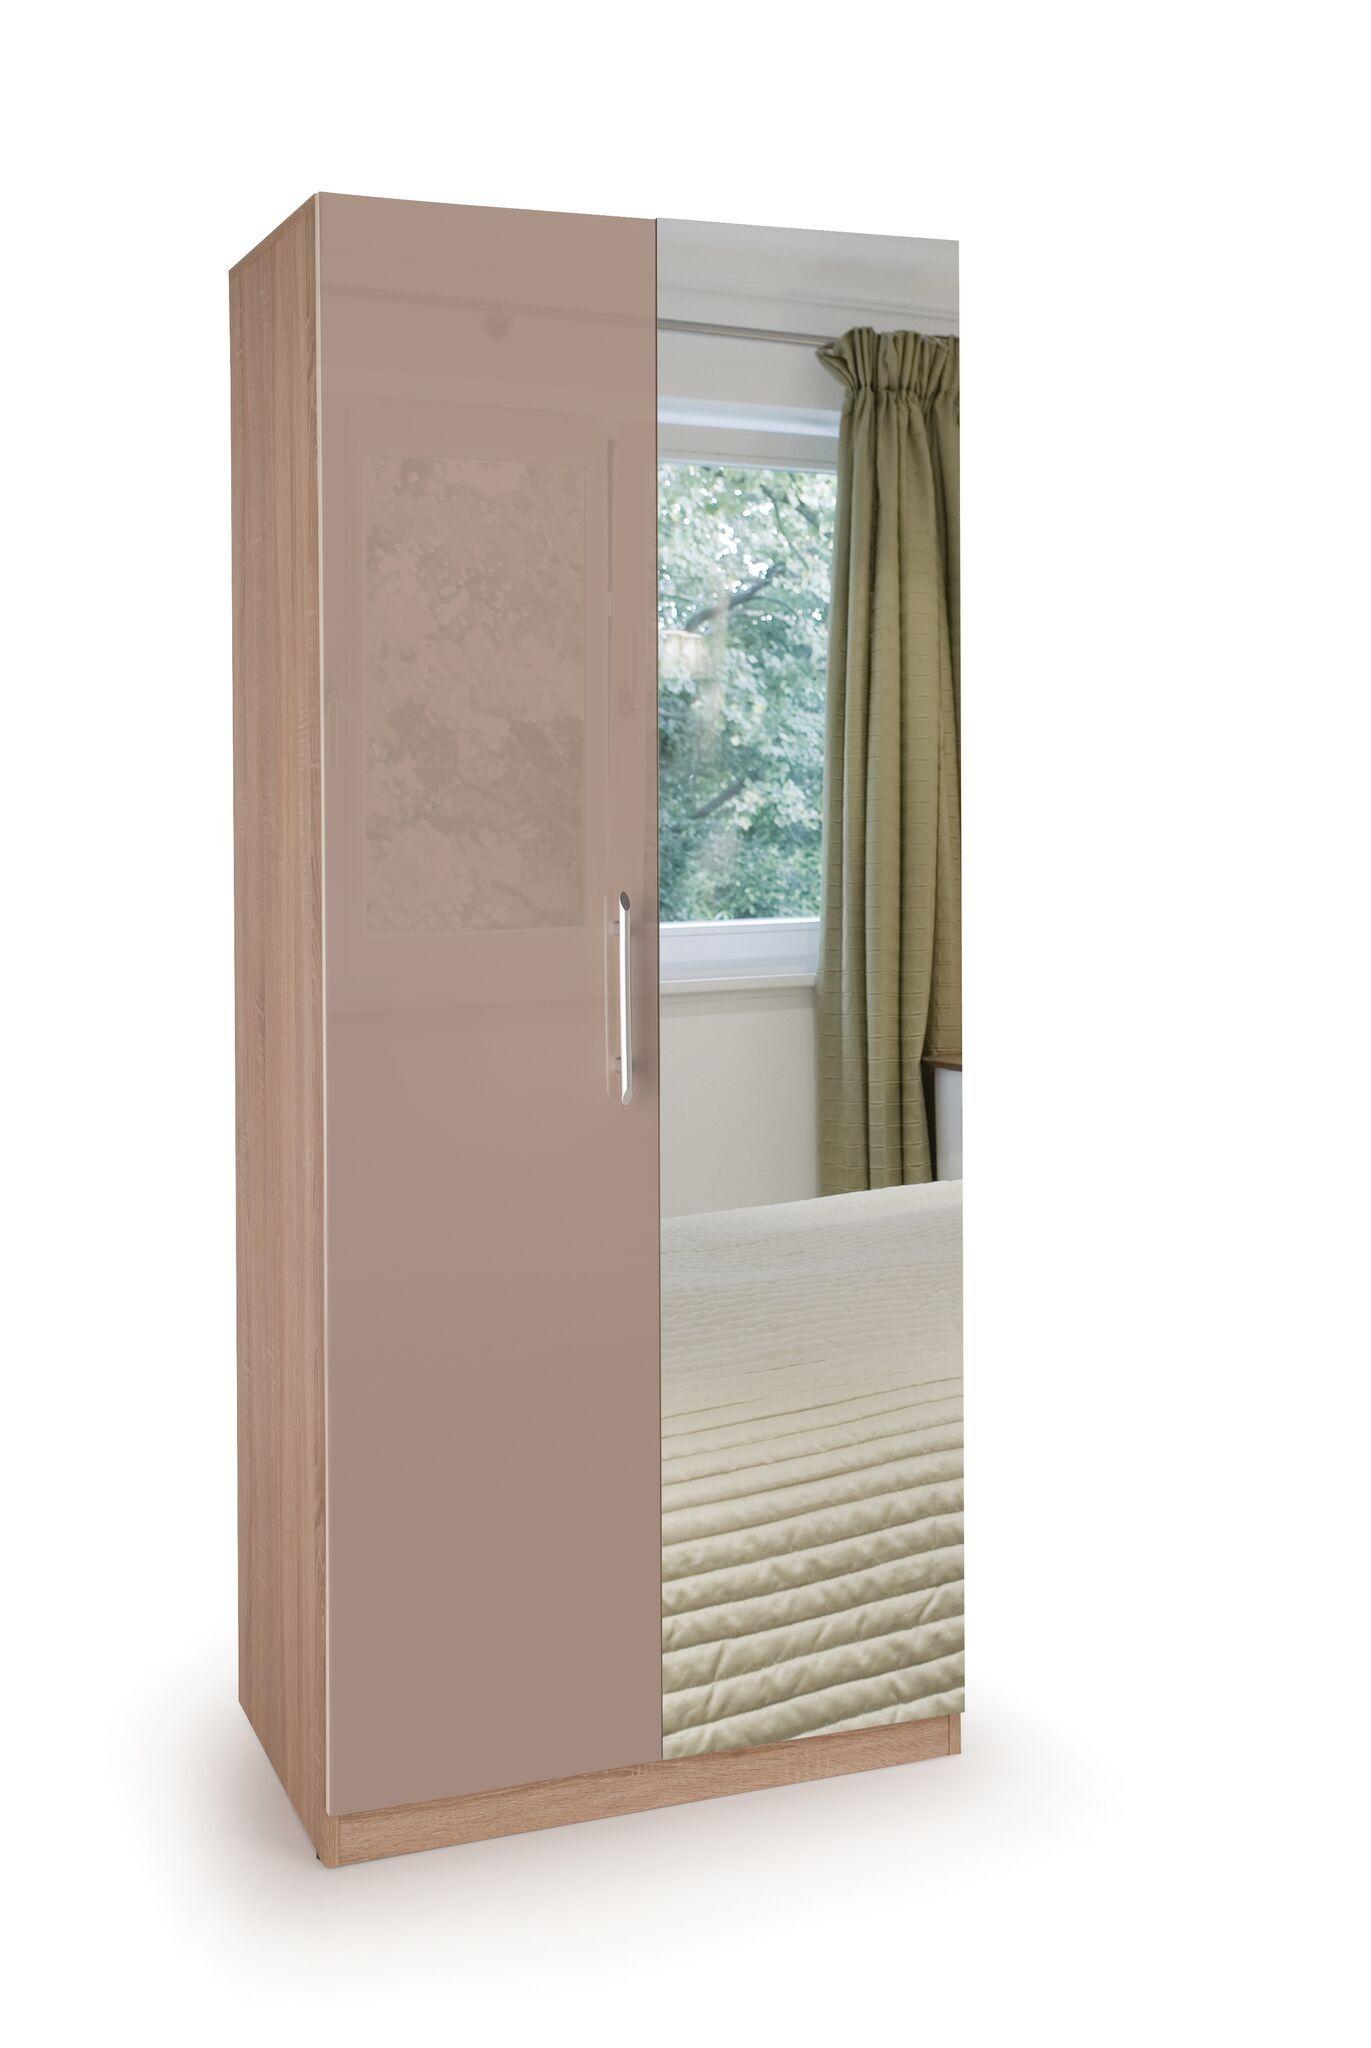 system for corner furniture luxury new ikea of wardrobe com sale wardrobes bedroom pax badotcom